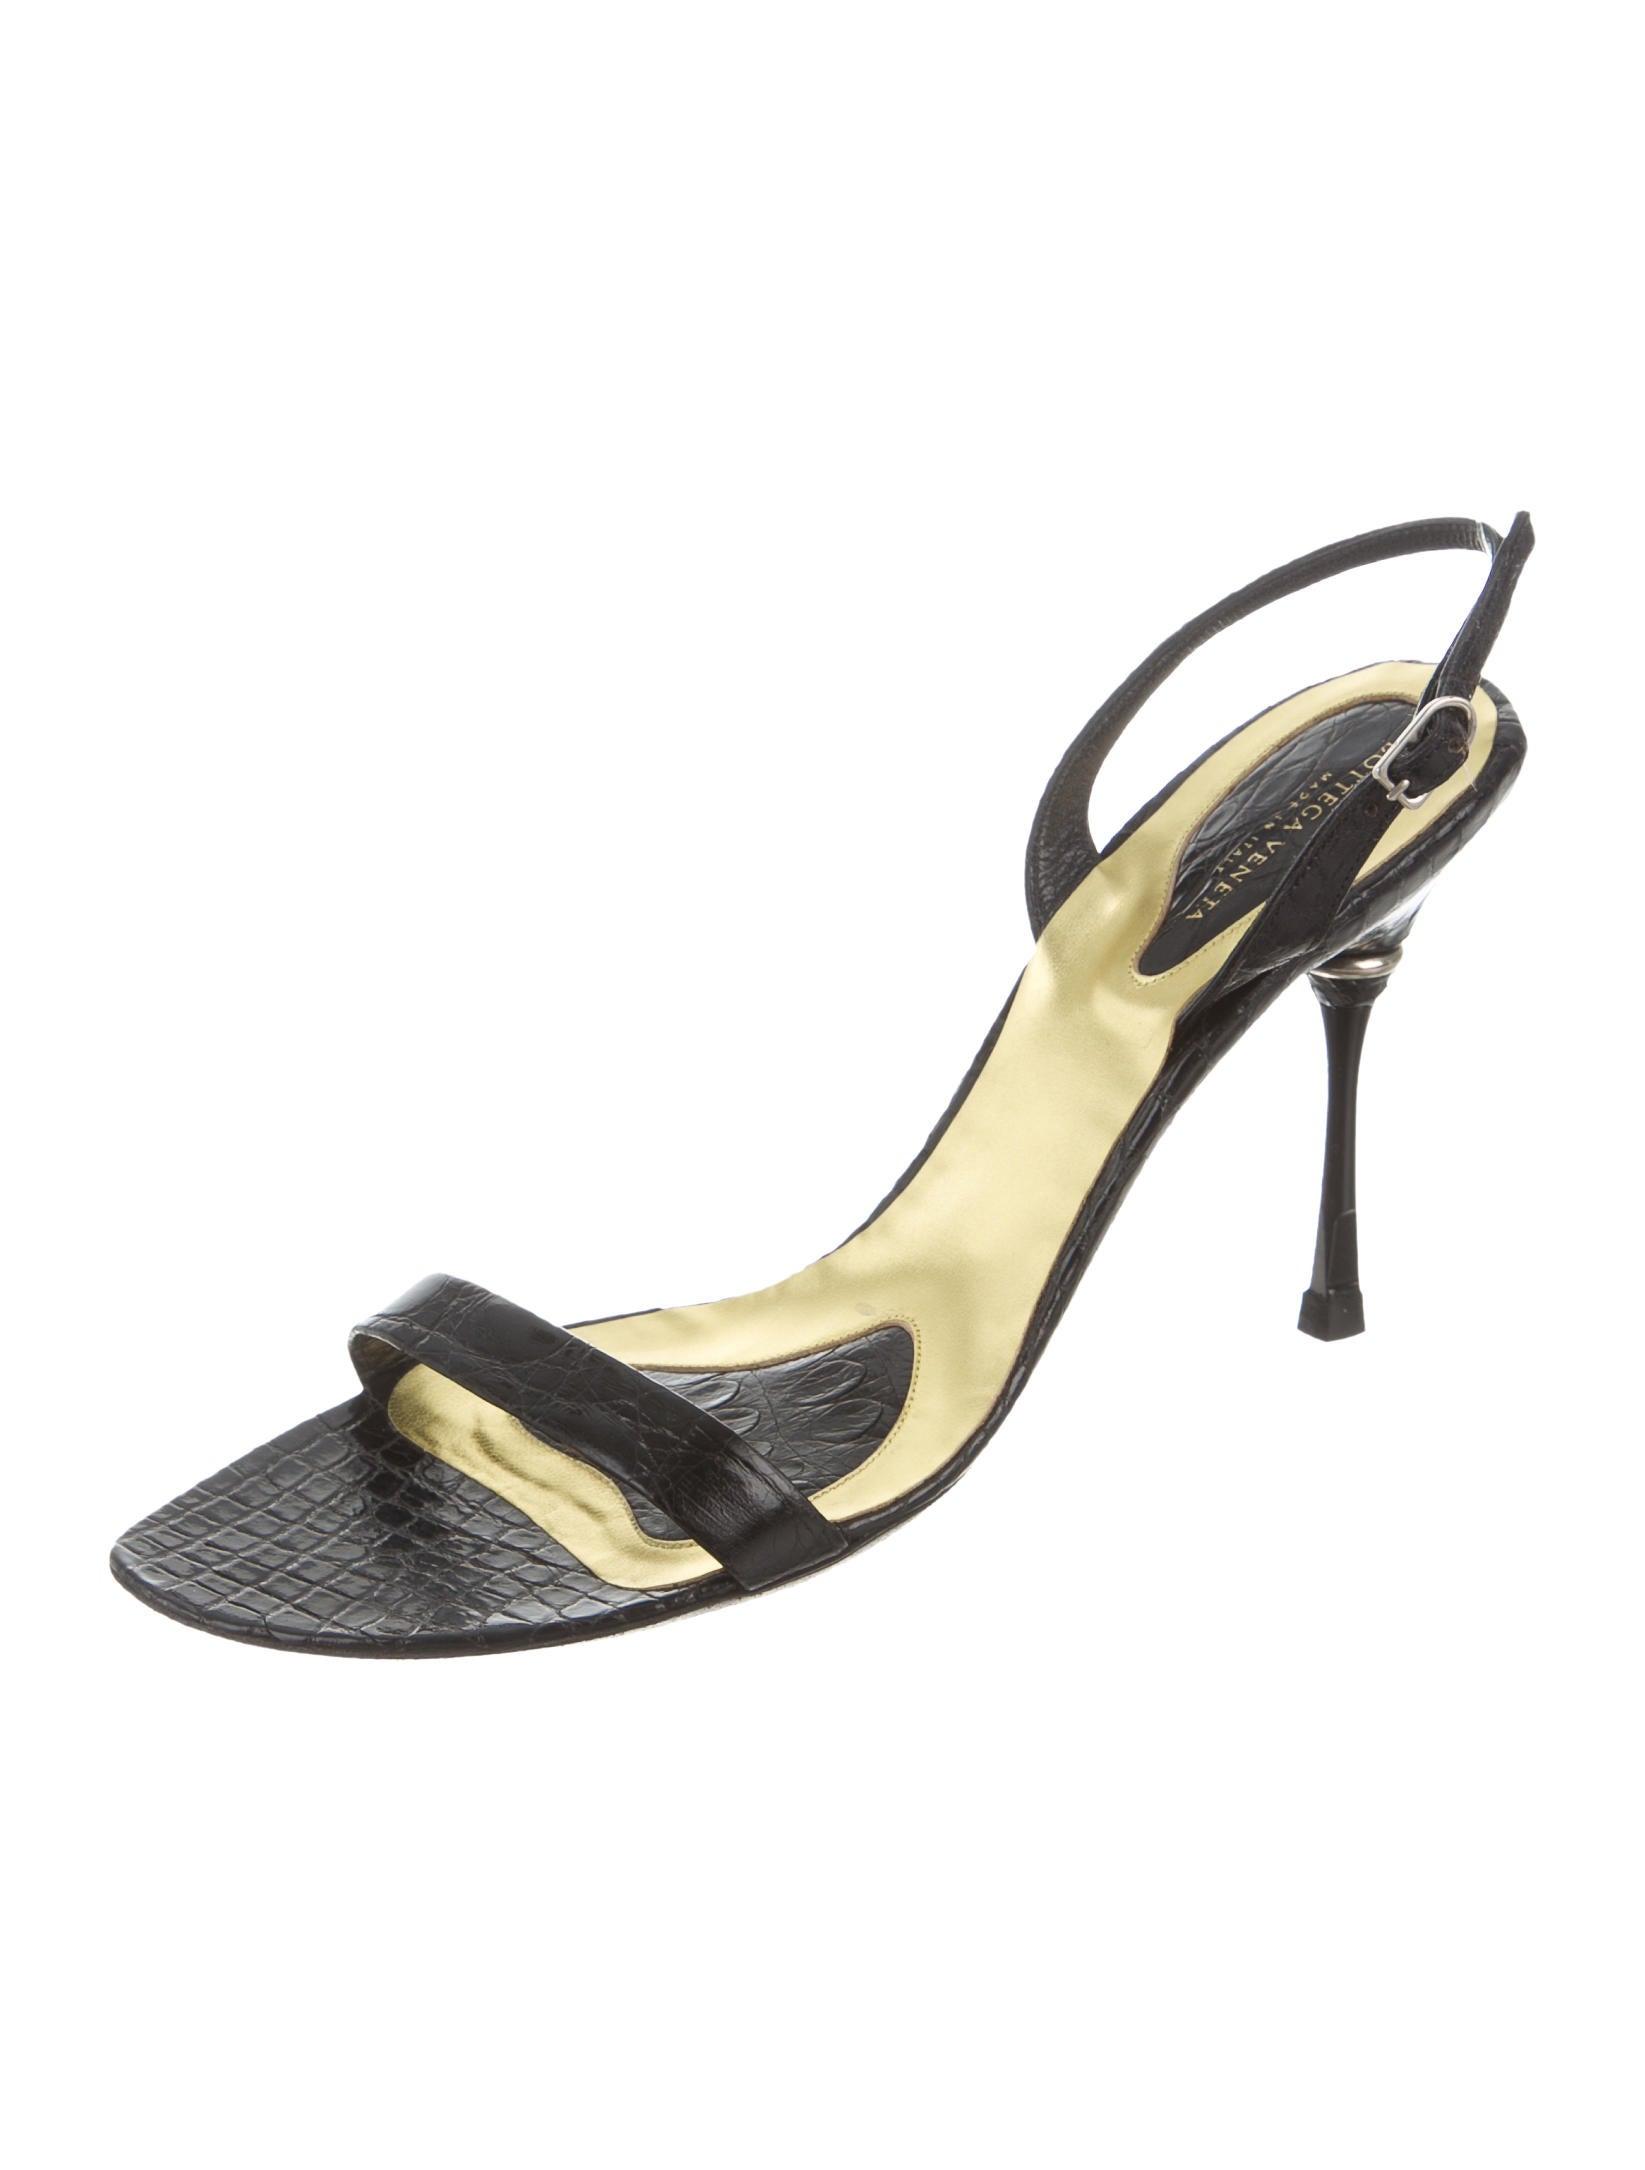 Bottega Veneta Alligator Slingback Sandals clearance browse visa payment online Uwf5D